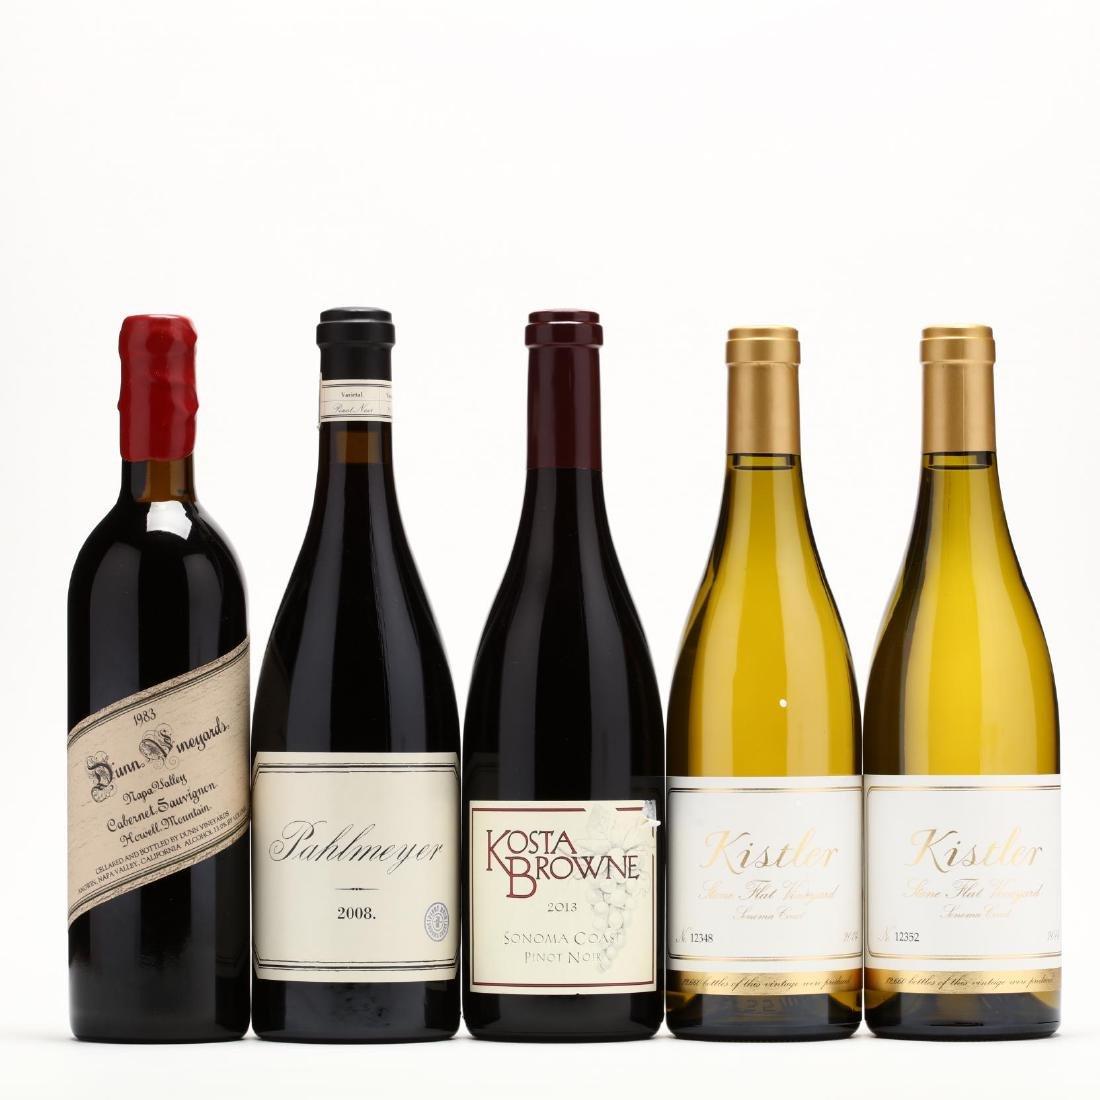 Wine Director's Choice California Selection